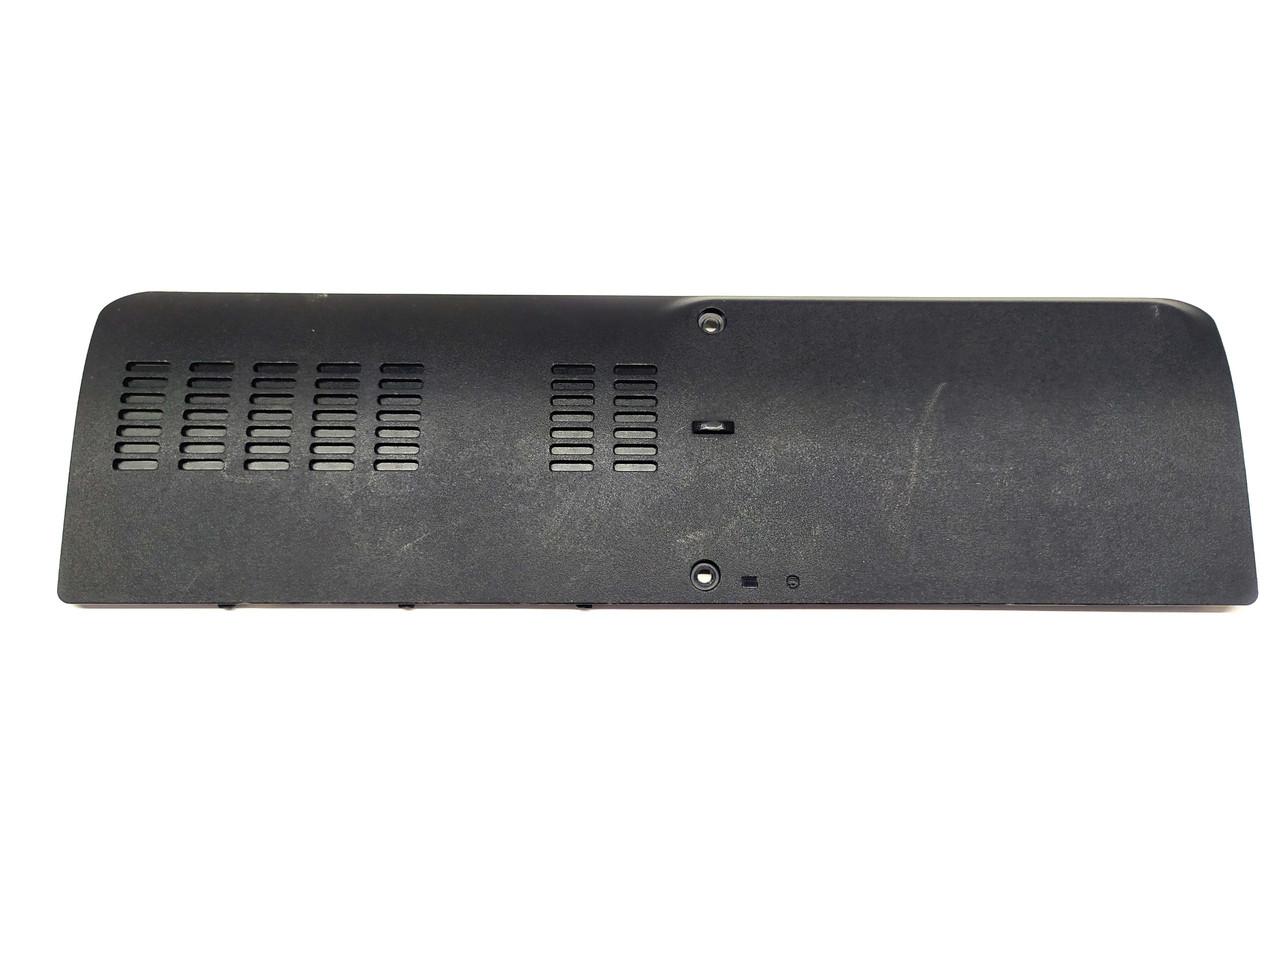 Сервисная крышка под оперативную память E cover для ноутбука Acer Aspire 5552